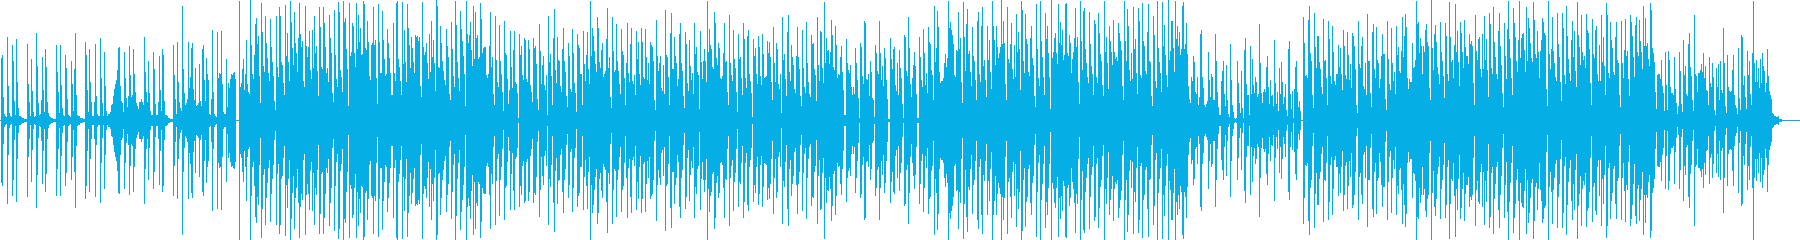 K-Pop,ジャケットチャレンジの再生済みの波形